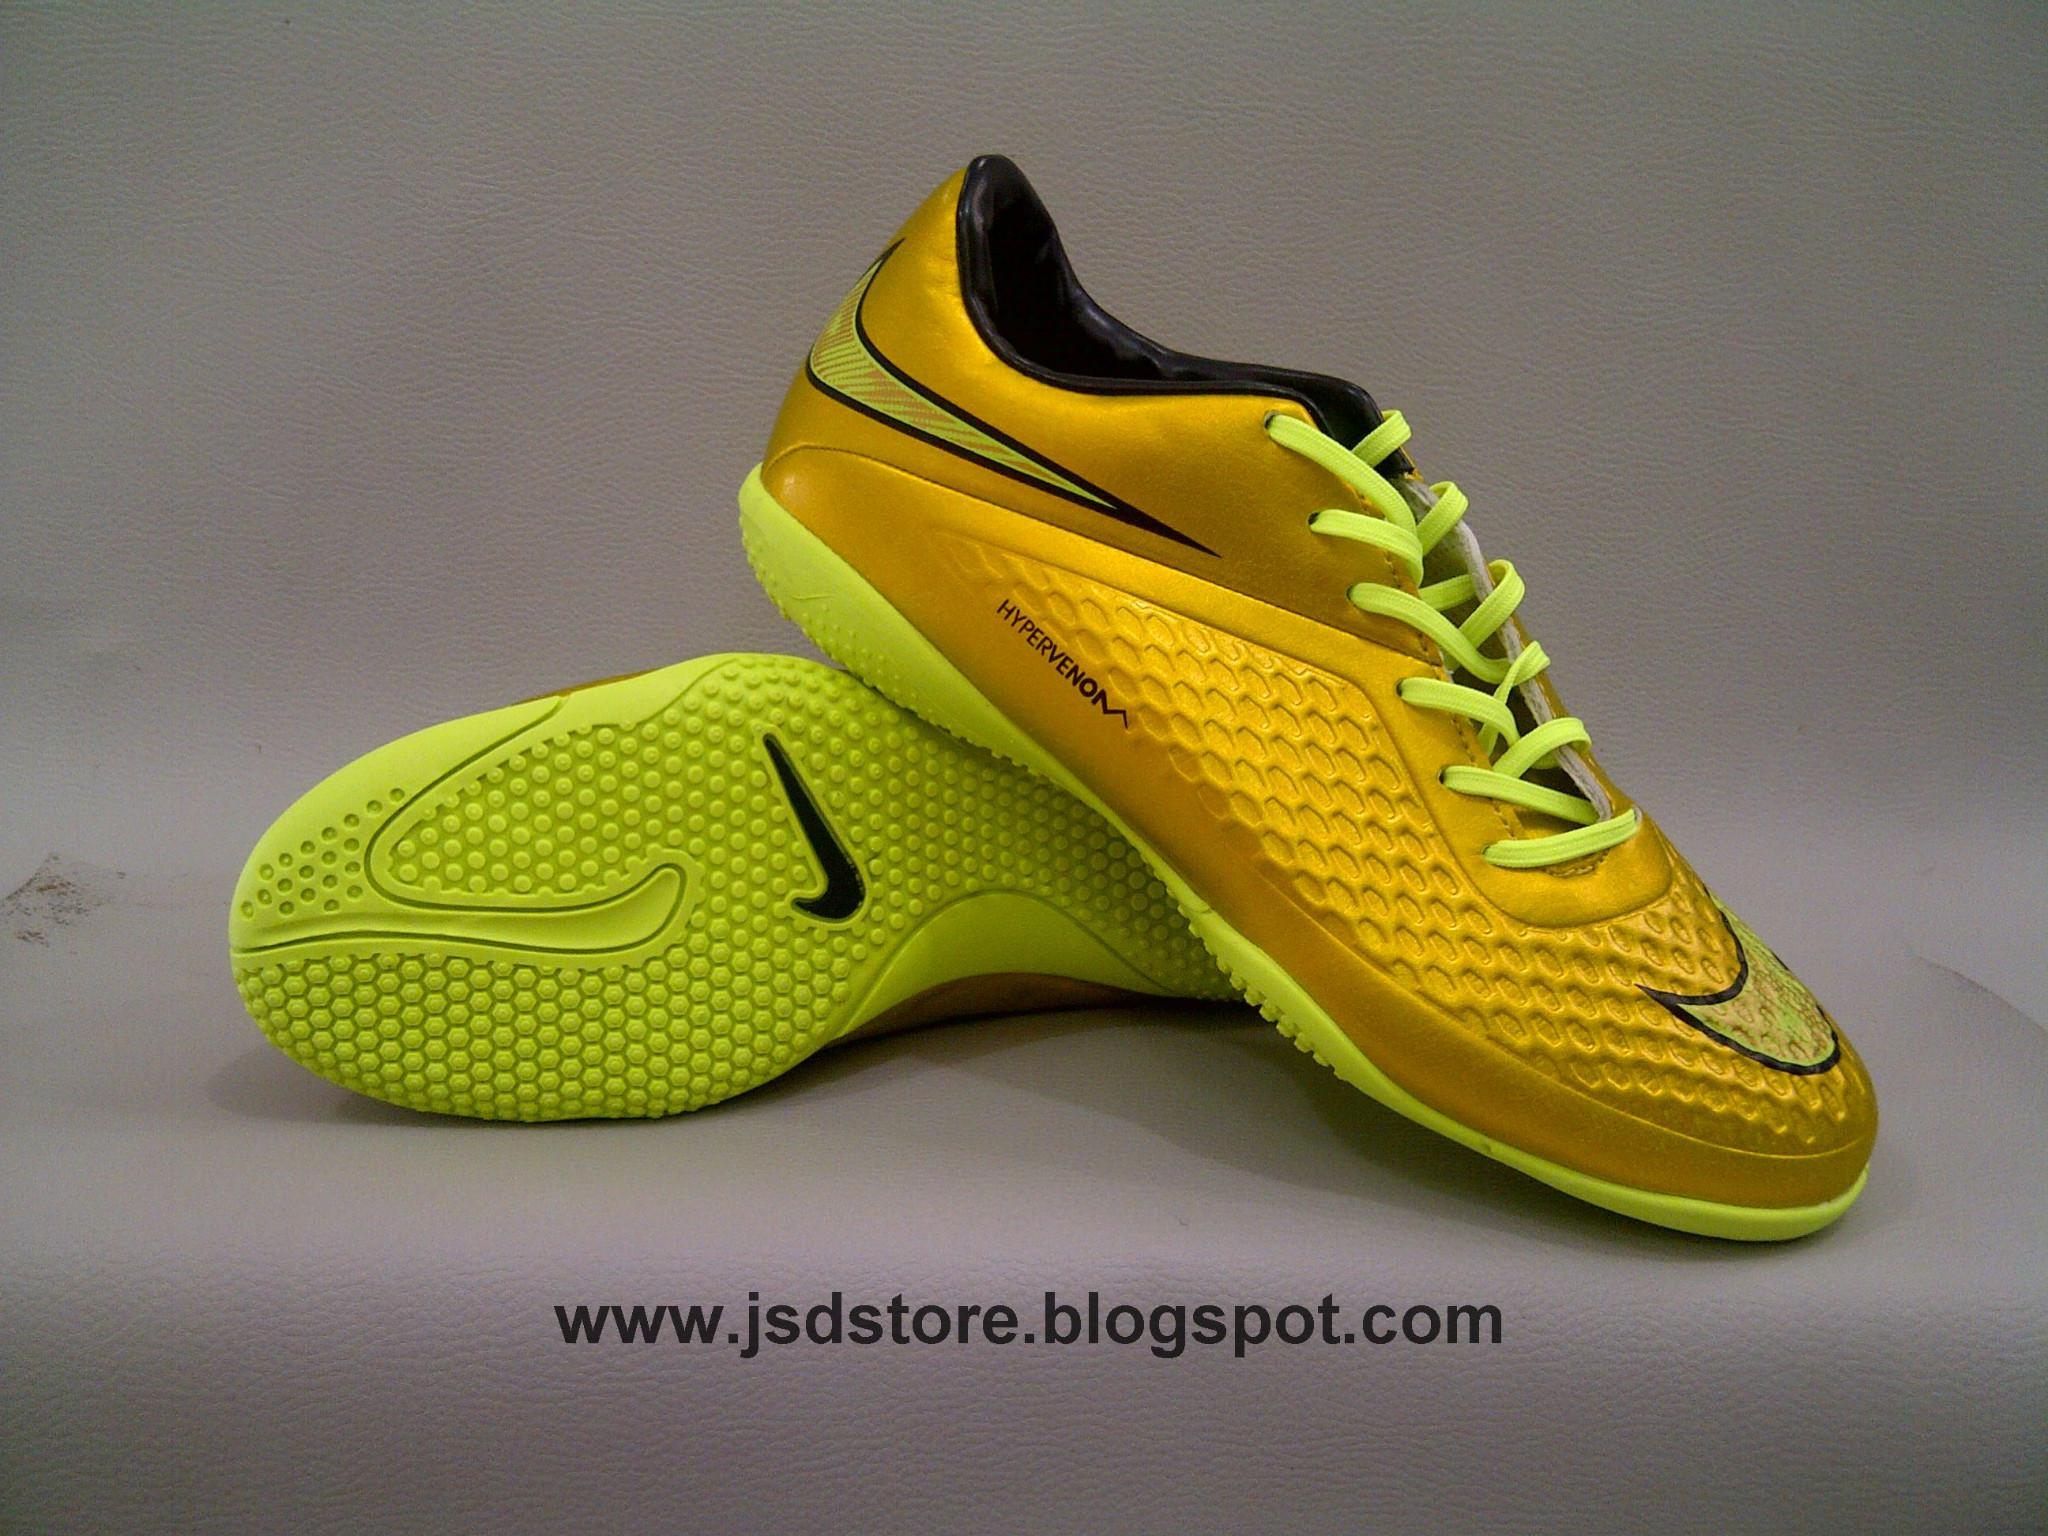 Gambar Sepatu Futsal Nike Hypervenom Phelon Ii Ic 749898 703 Hijau